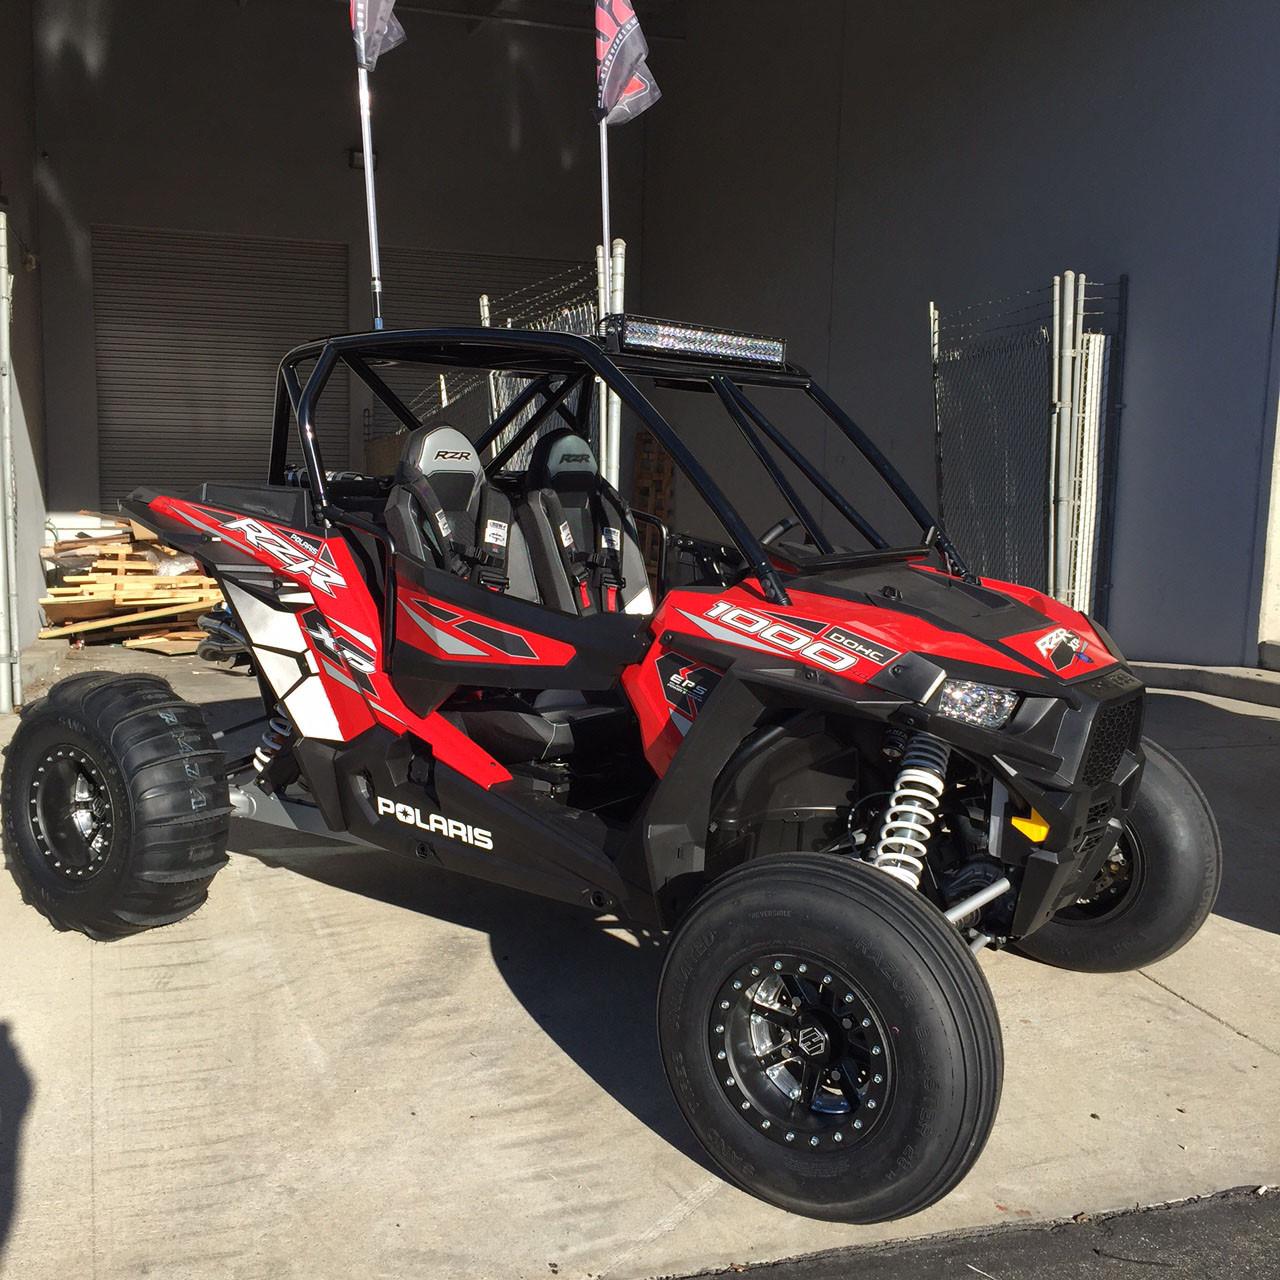 Xp2 Shorty Cage Polaris Rzr Xp 1000 Sdr Motorsports